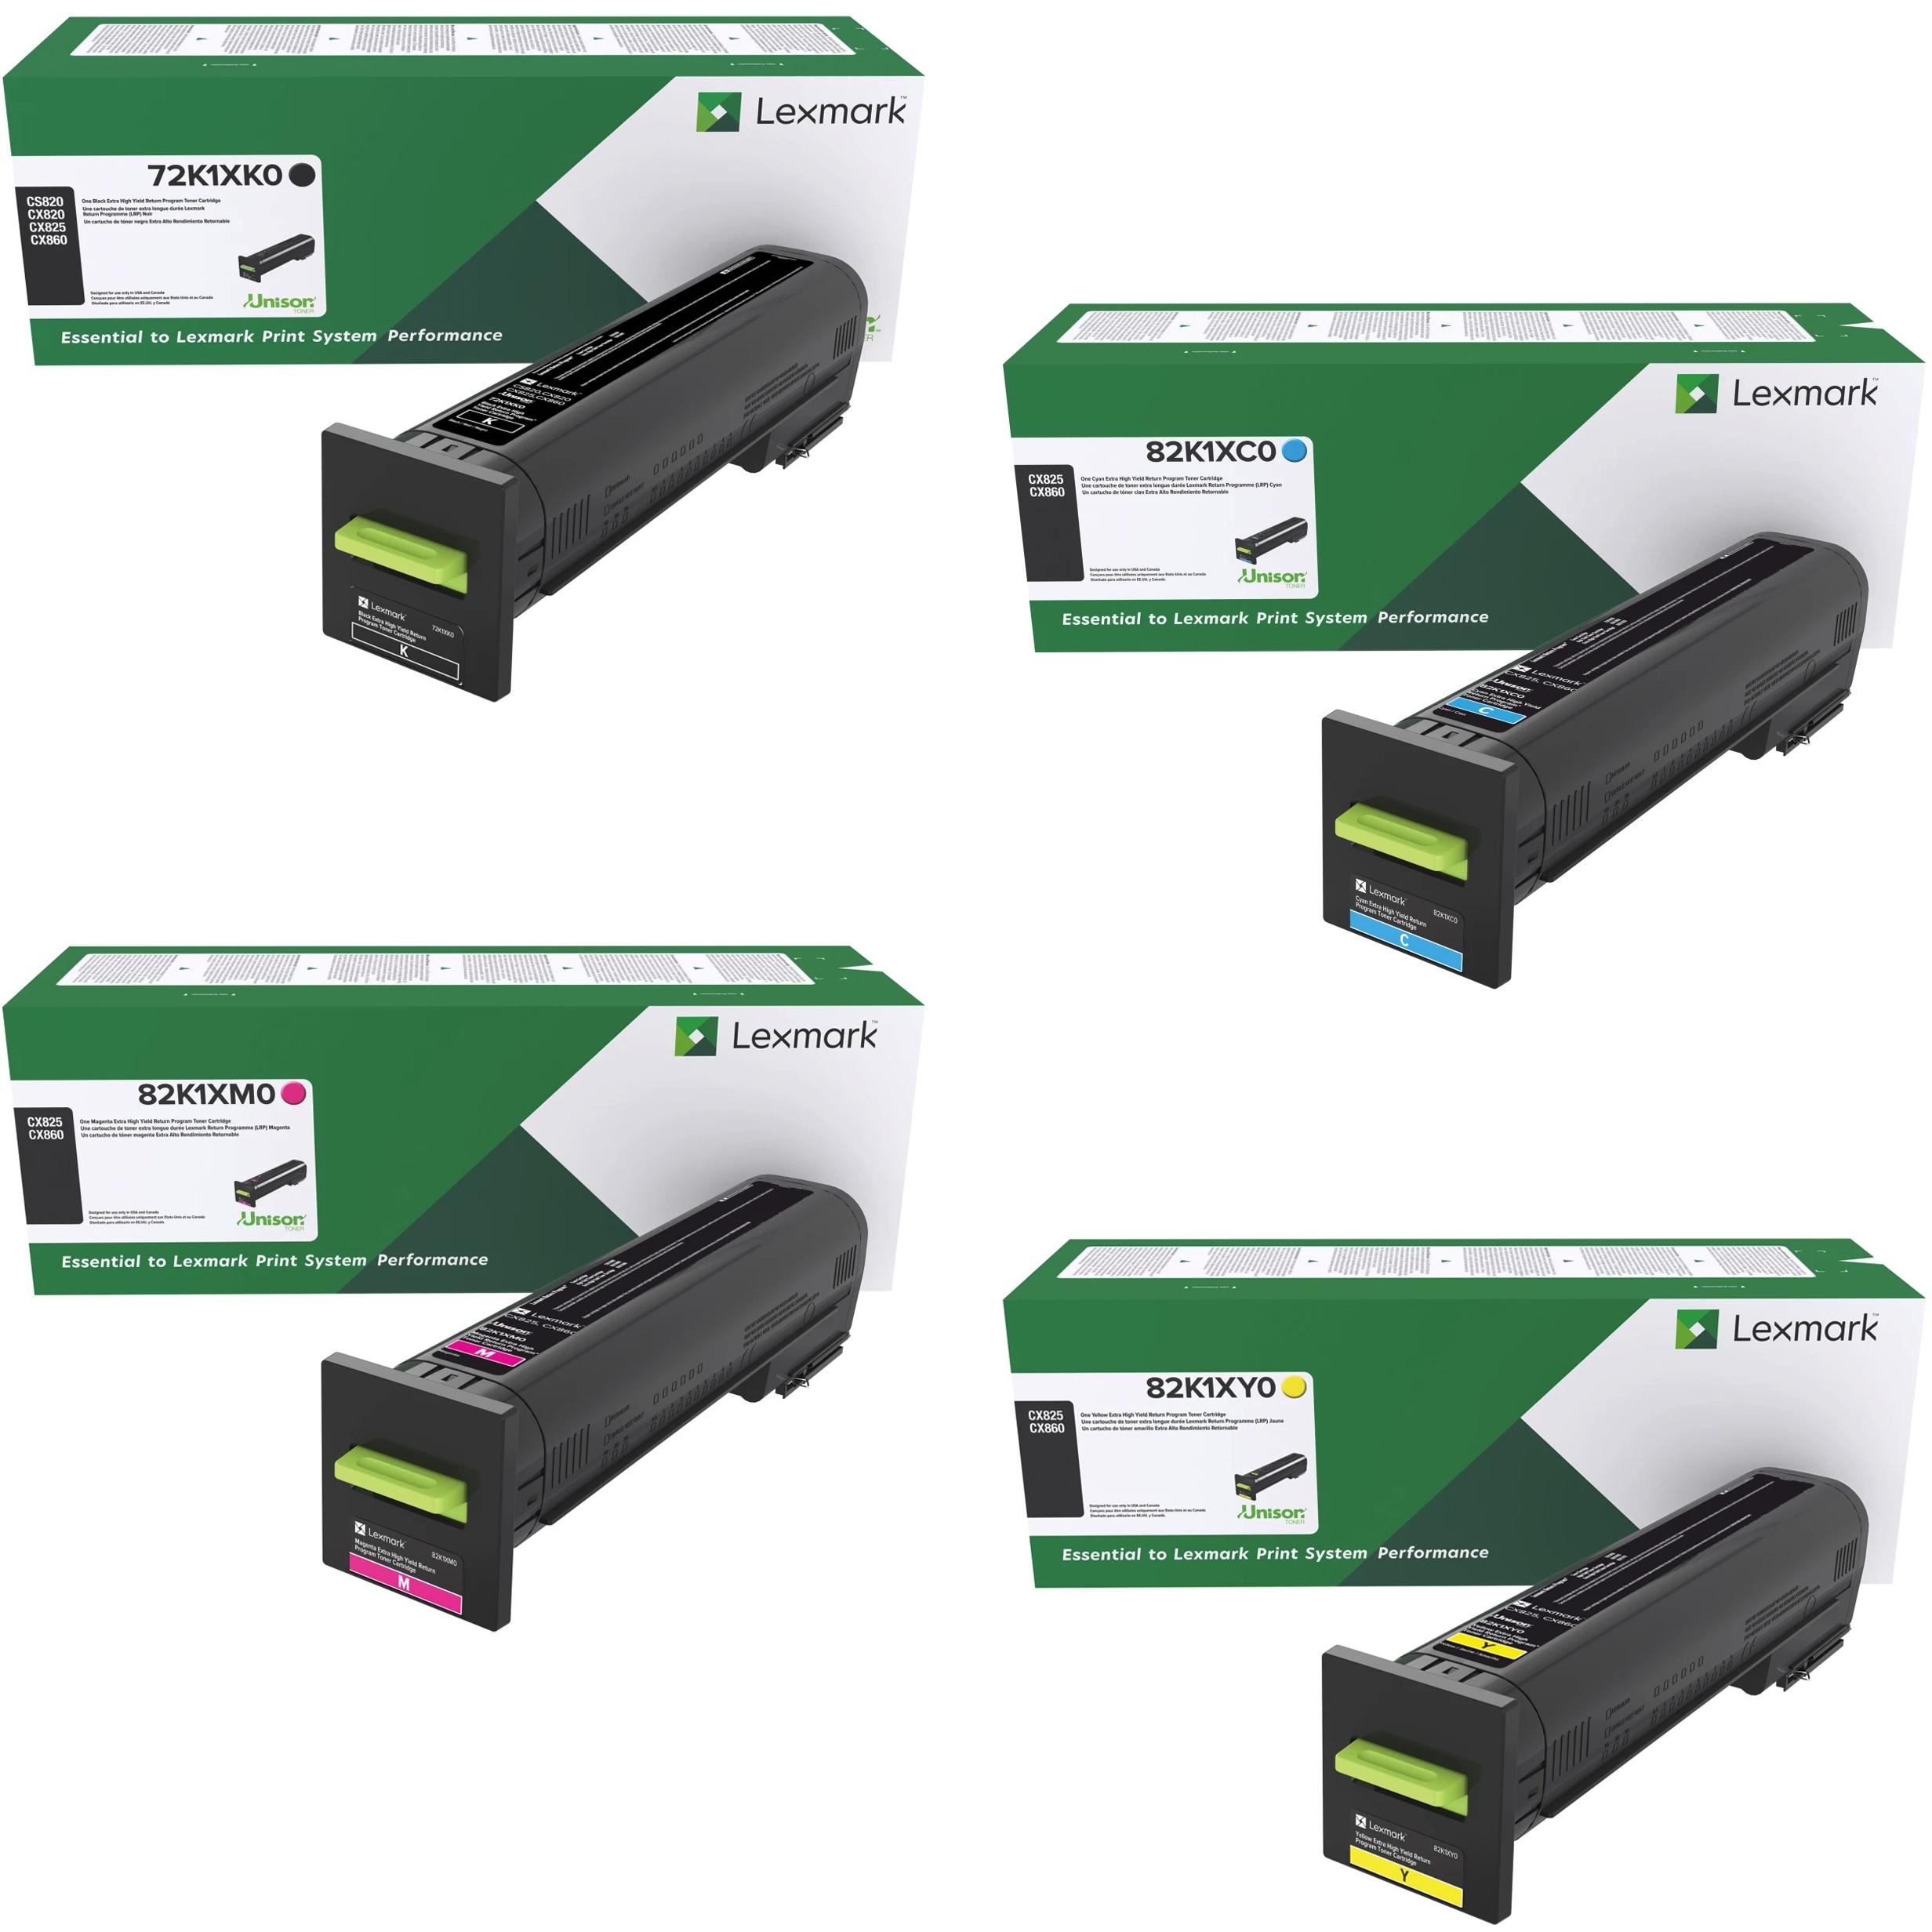 Lexmark CX820XHY Set | 72K1XK0 82K1XC0 82K1XM0 82K1XY0 | Original Lexmark Toner Cartridges – Black, Cyan, Magenta, Yellow